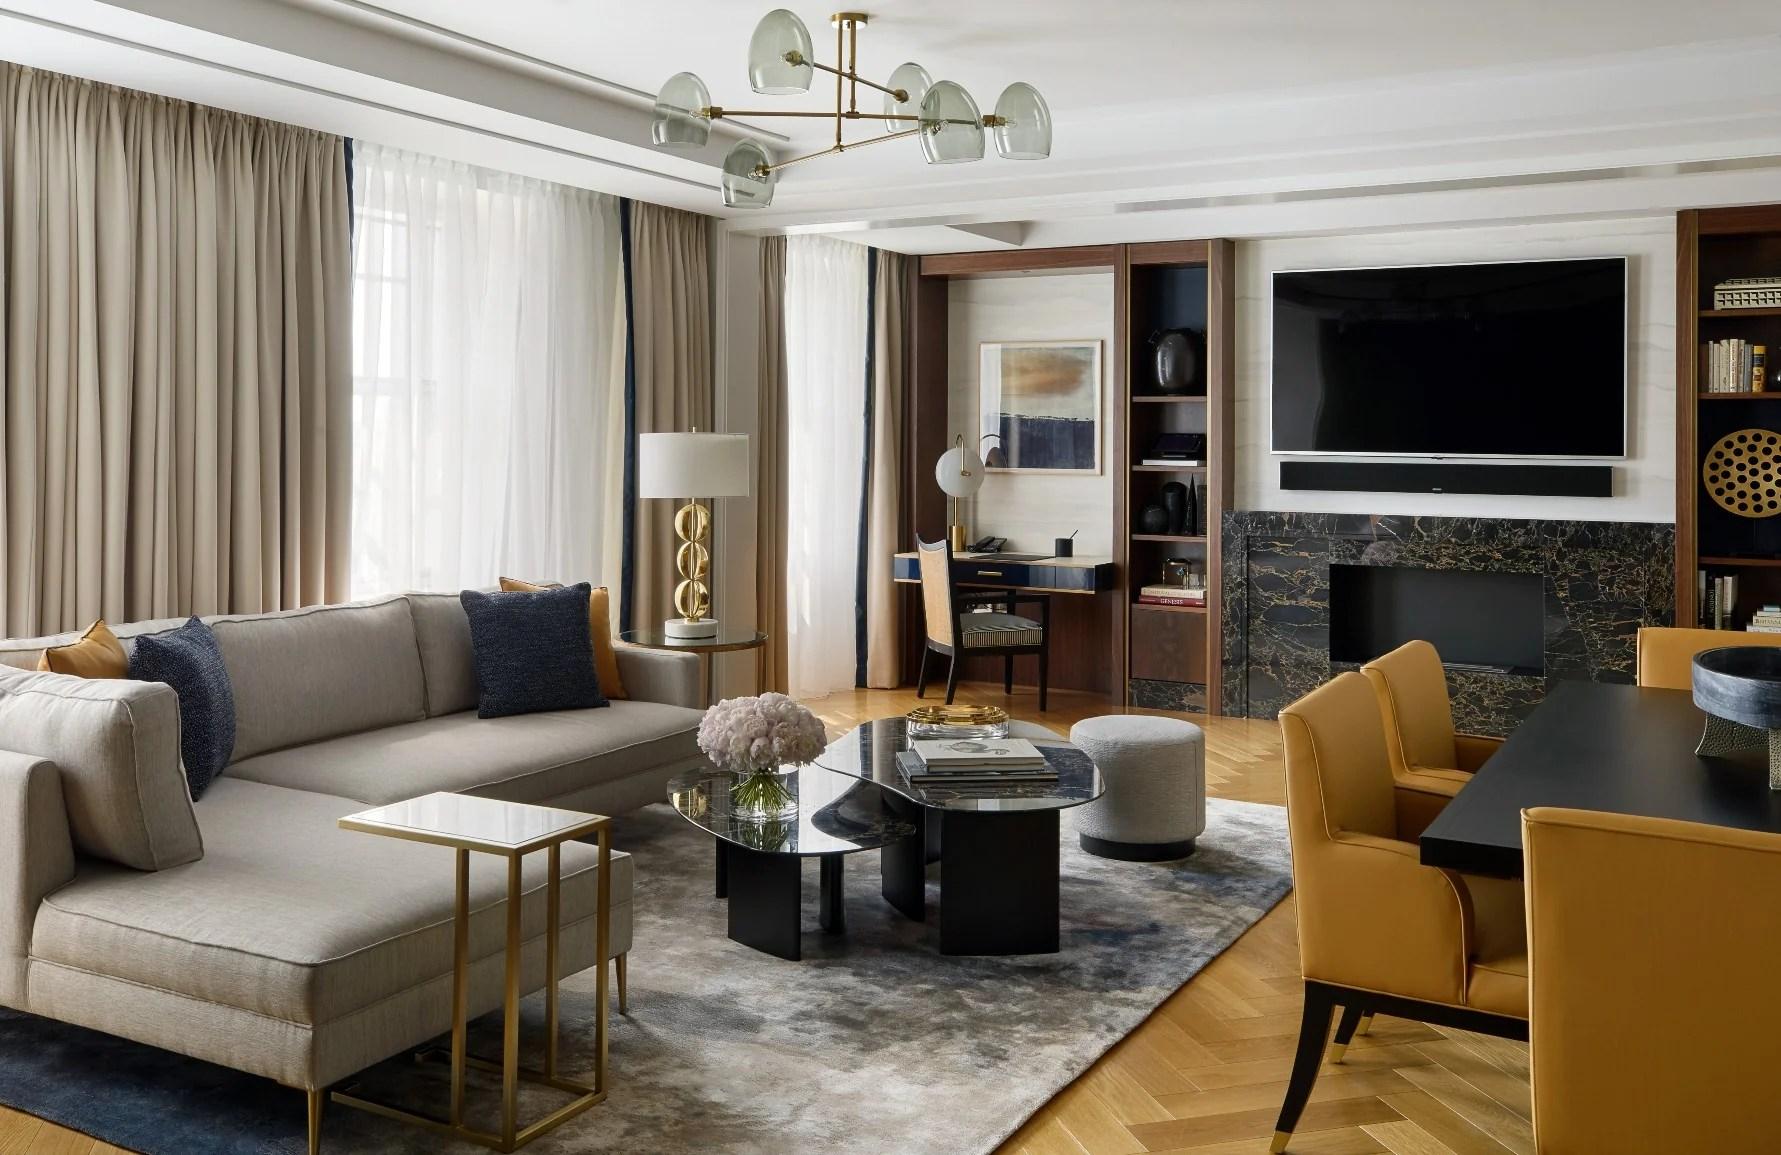 8 living room lighting ideas lounge